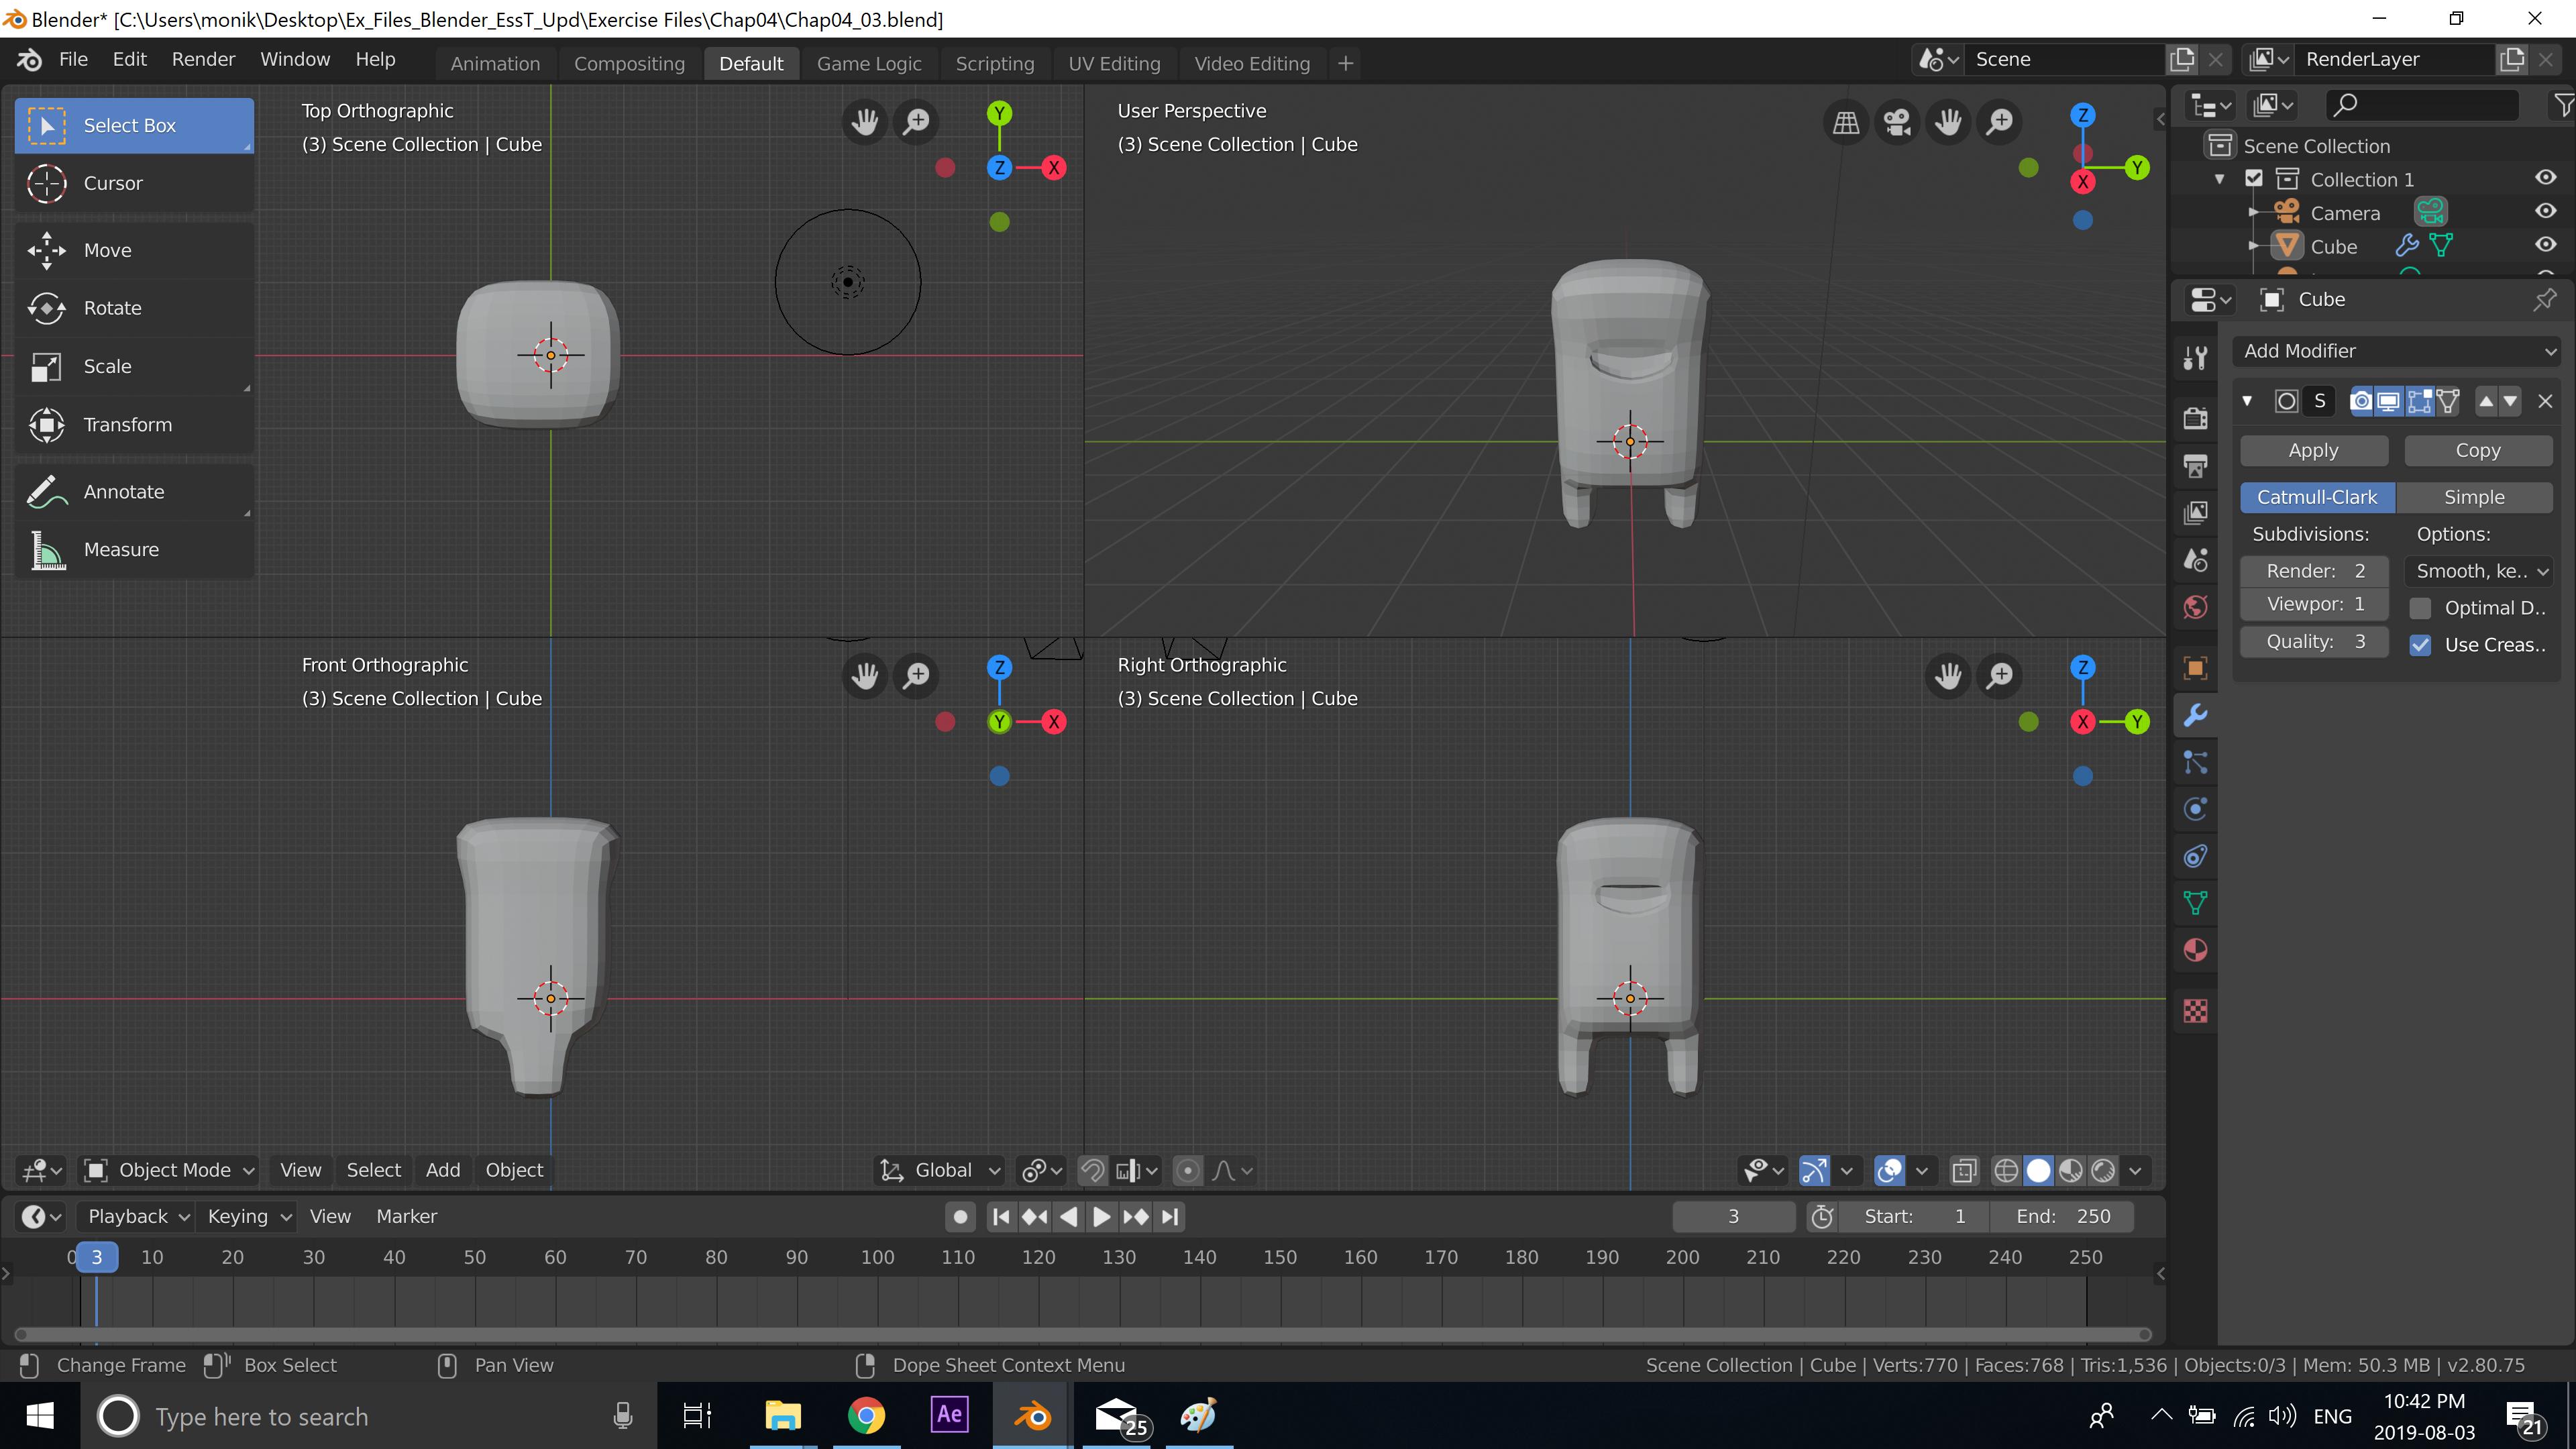 Blender 3D Character creation under Feifei Digital Ltd   Monika Szucs